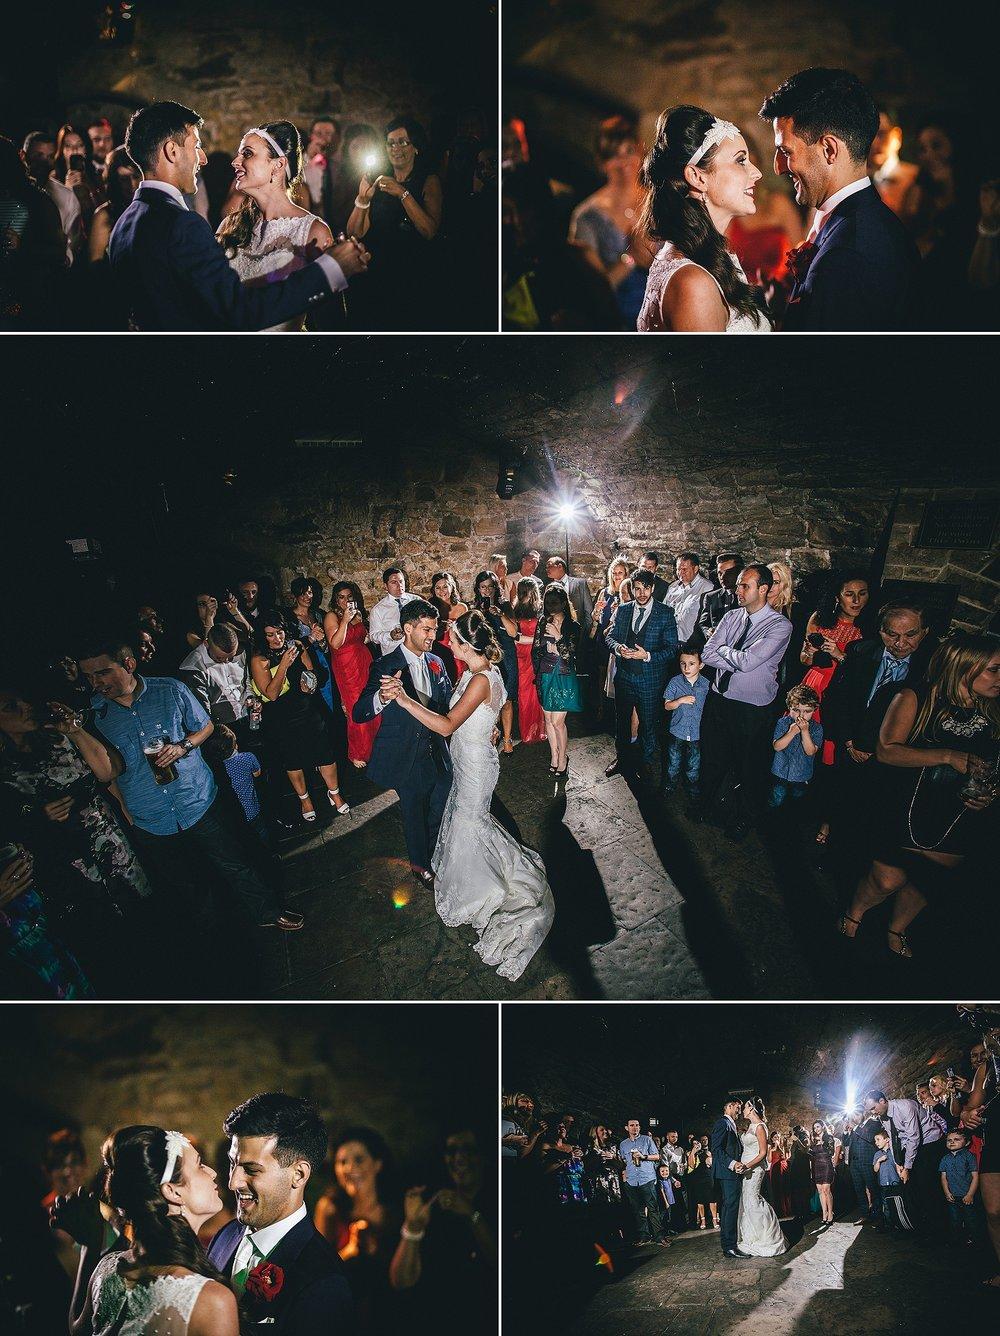 2014-WS-Claire-Pietro-0020.jpg